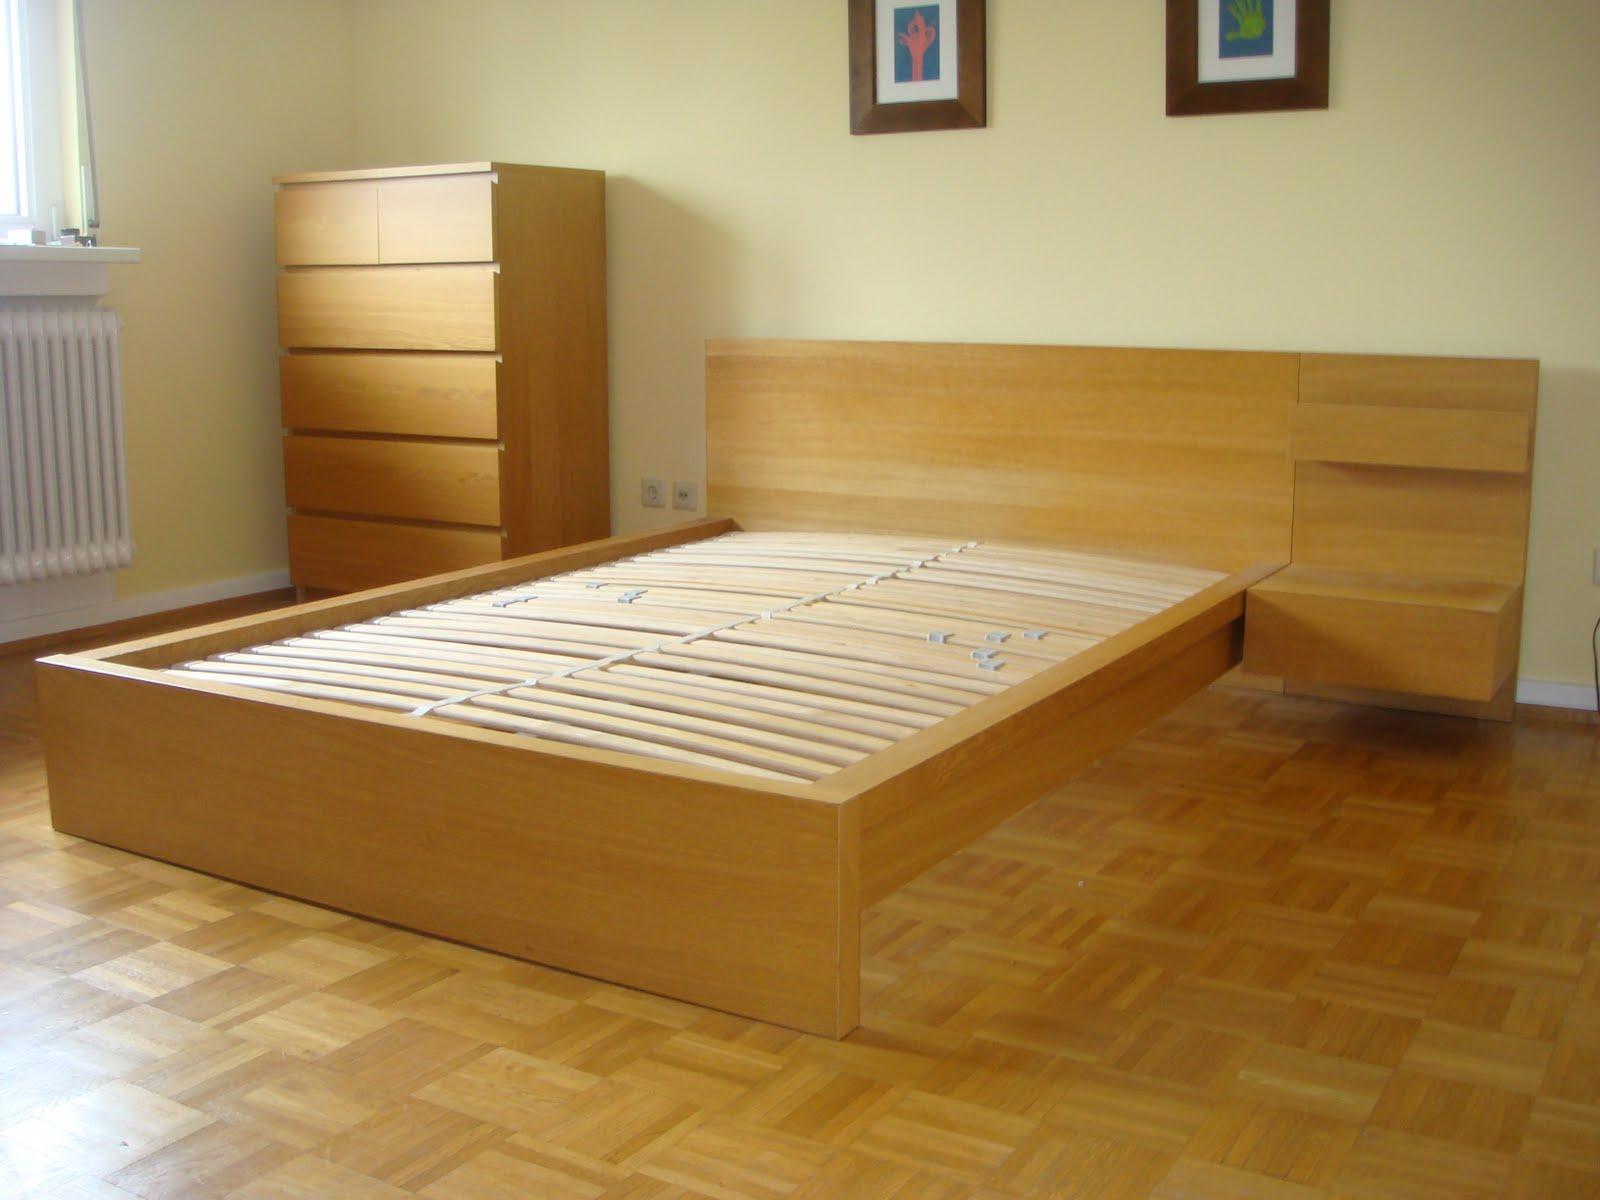 Ikea malm bedroom furniture